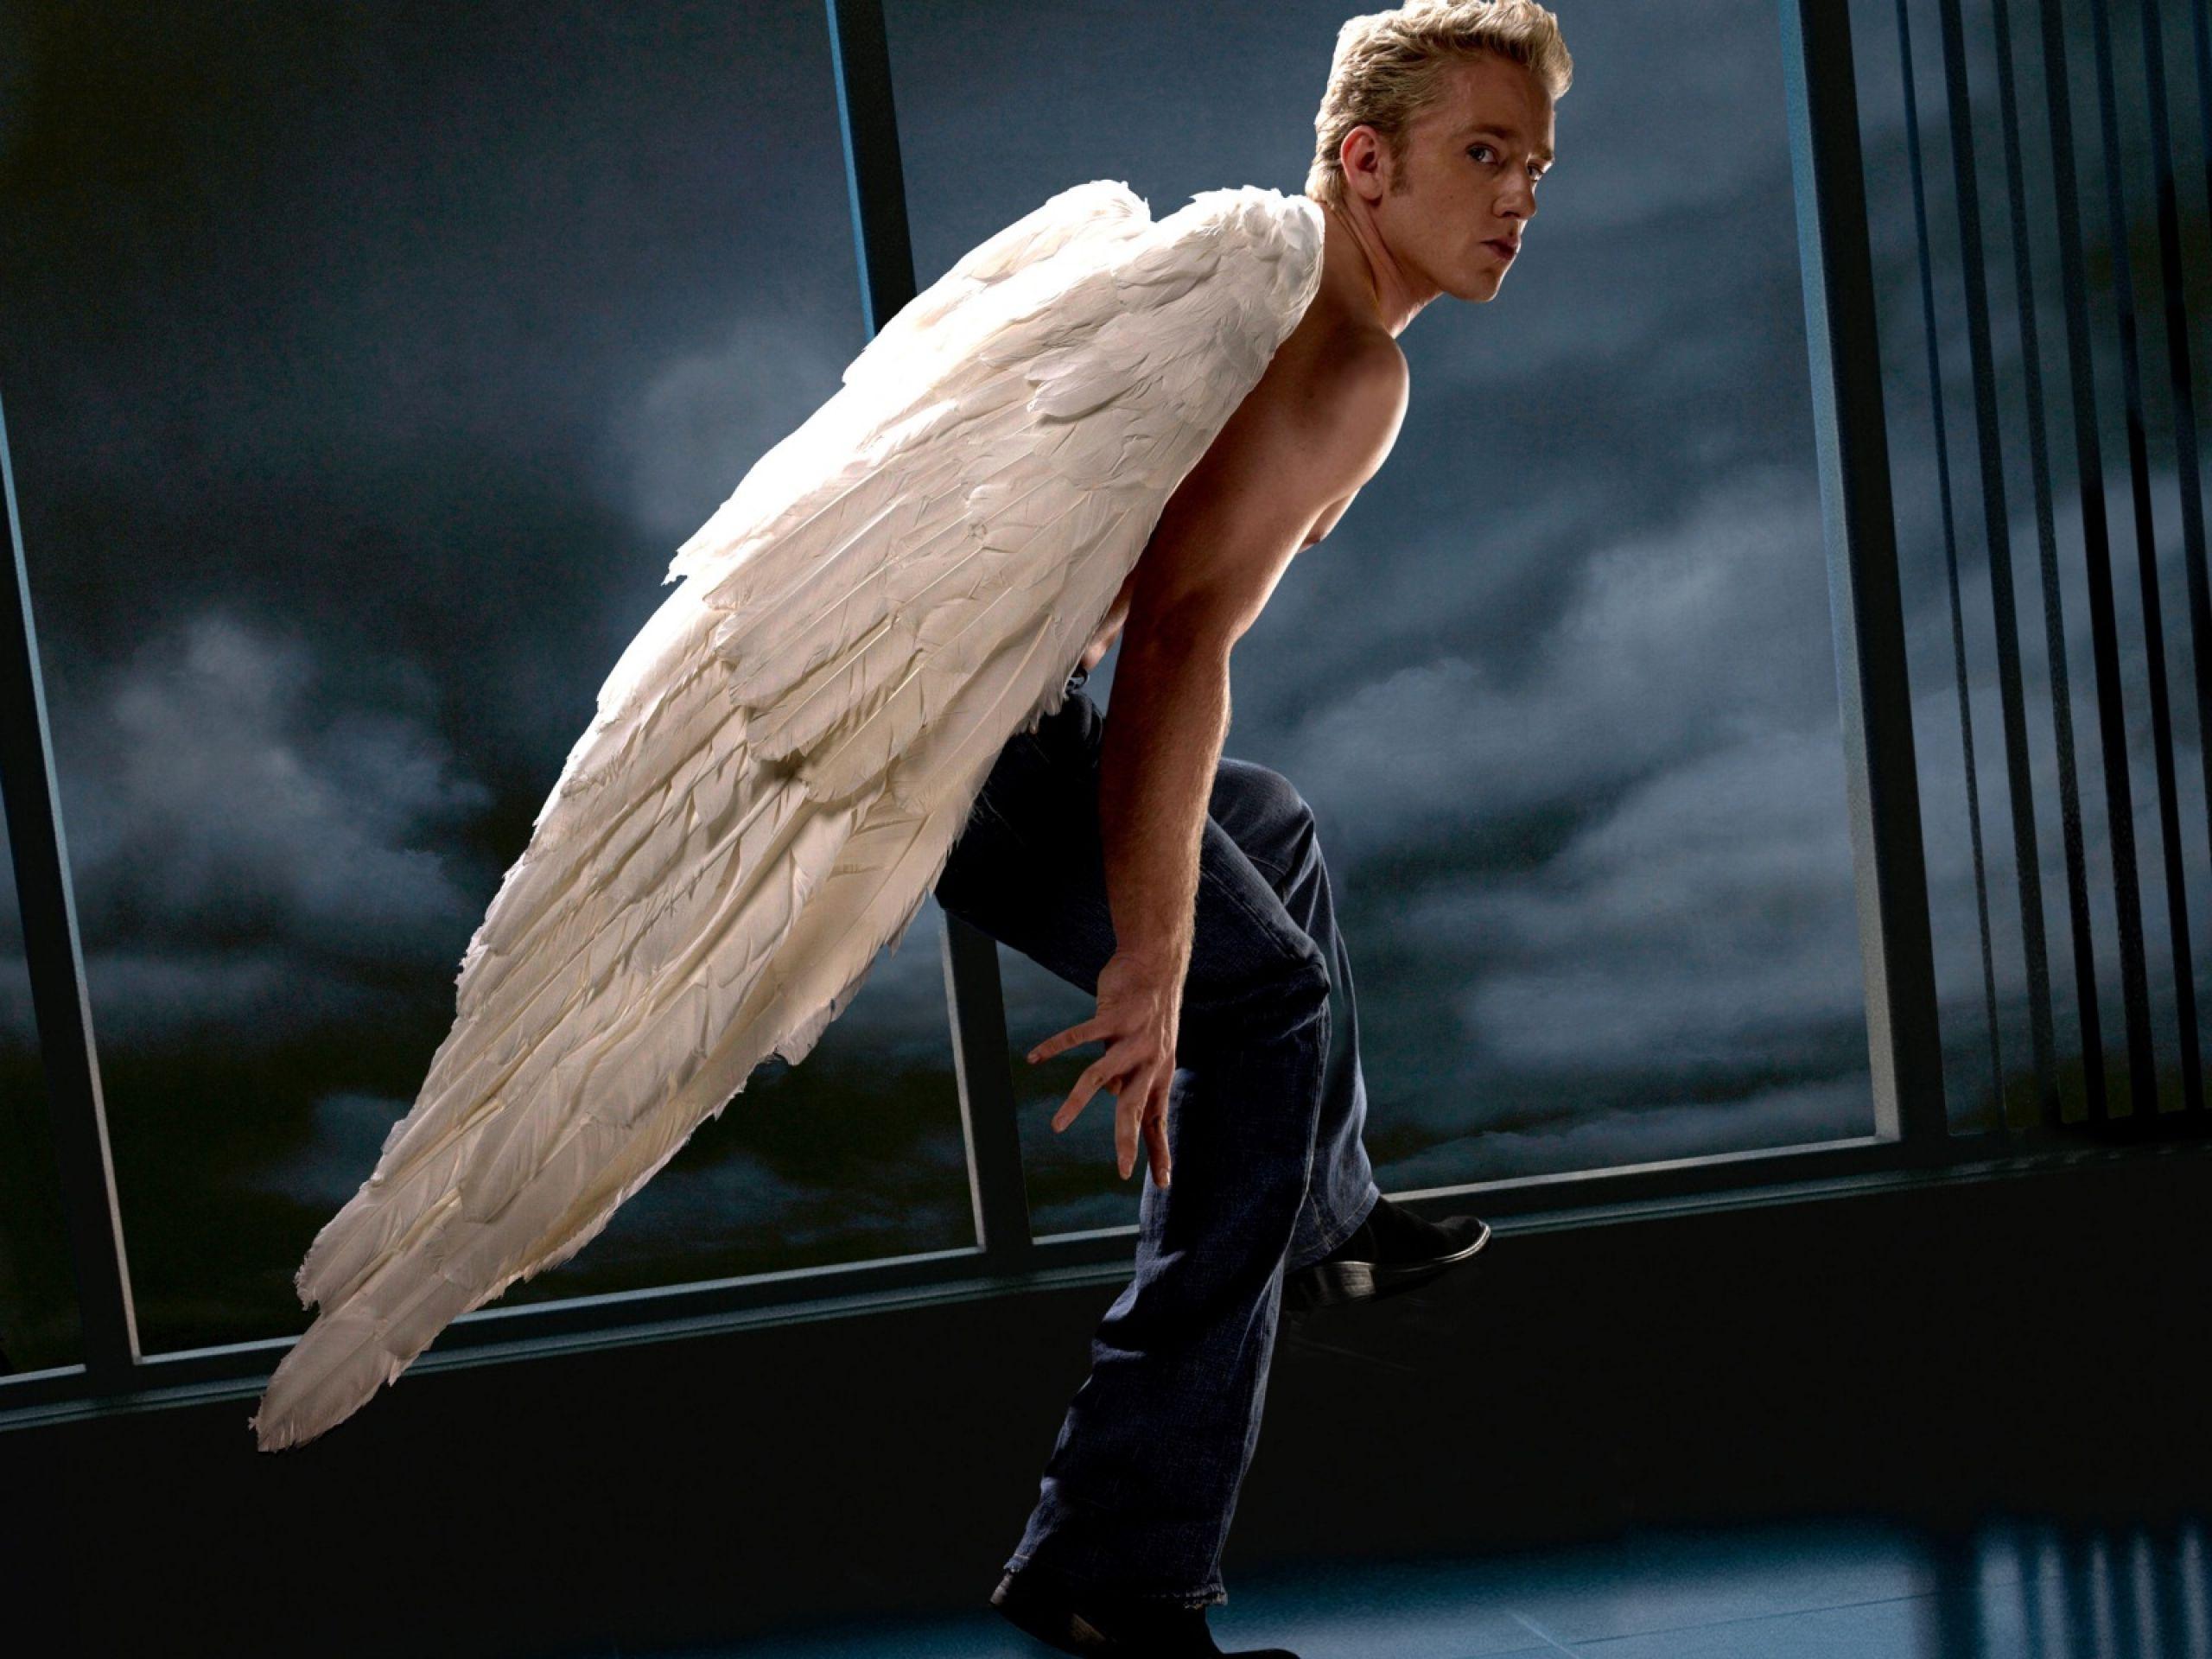 X Men Angel Promotional image of Angel